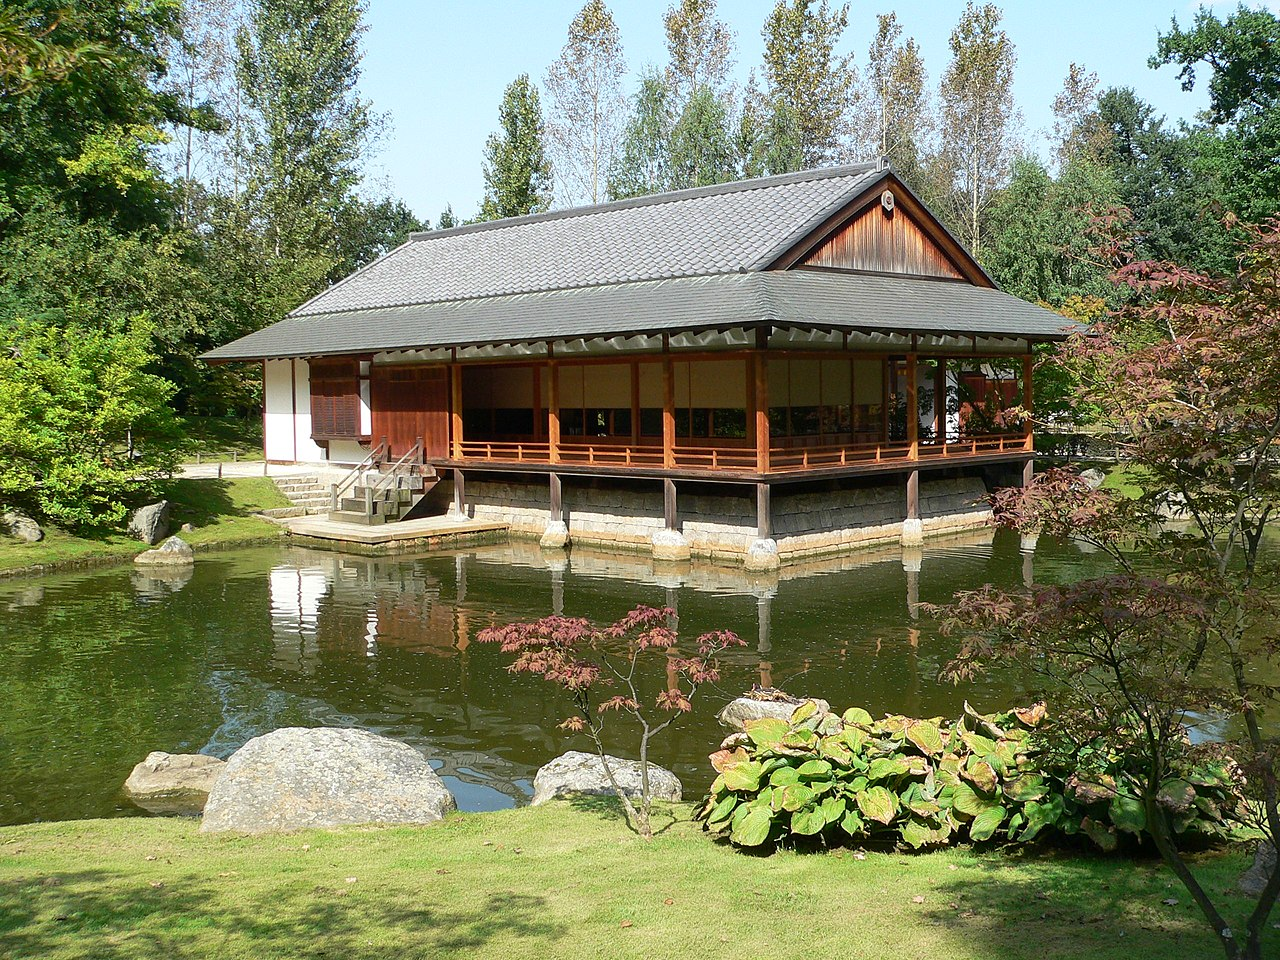 Datei:Hasselt Japanischer Garten Teehaus 20060906.JPG